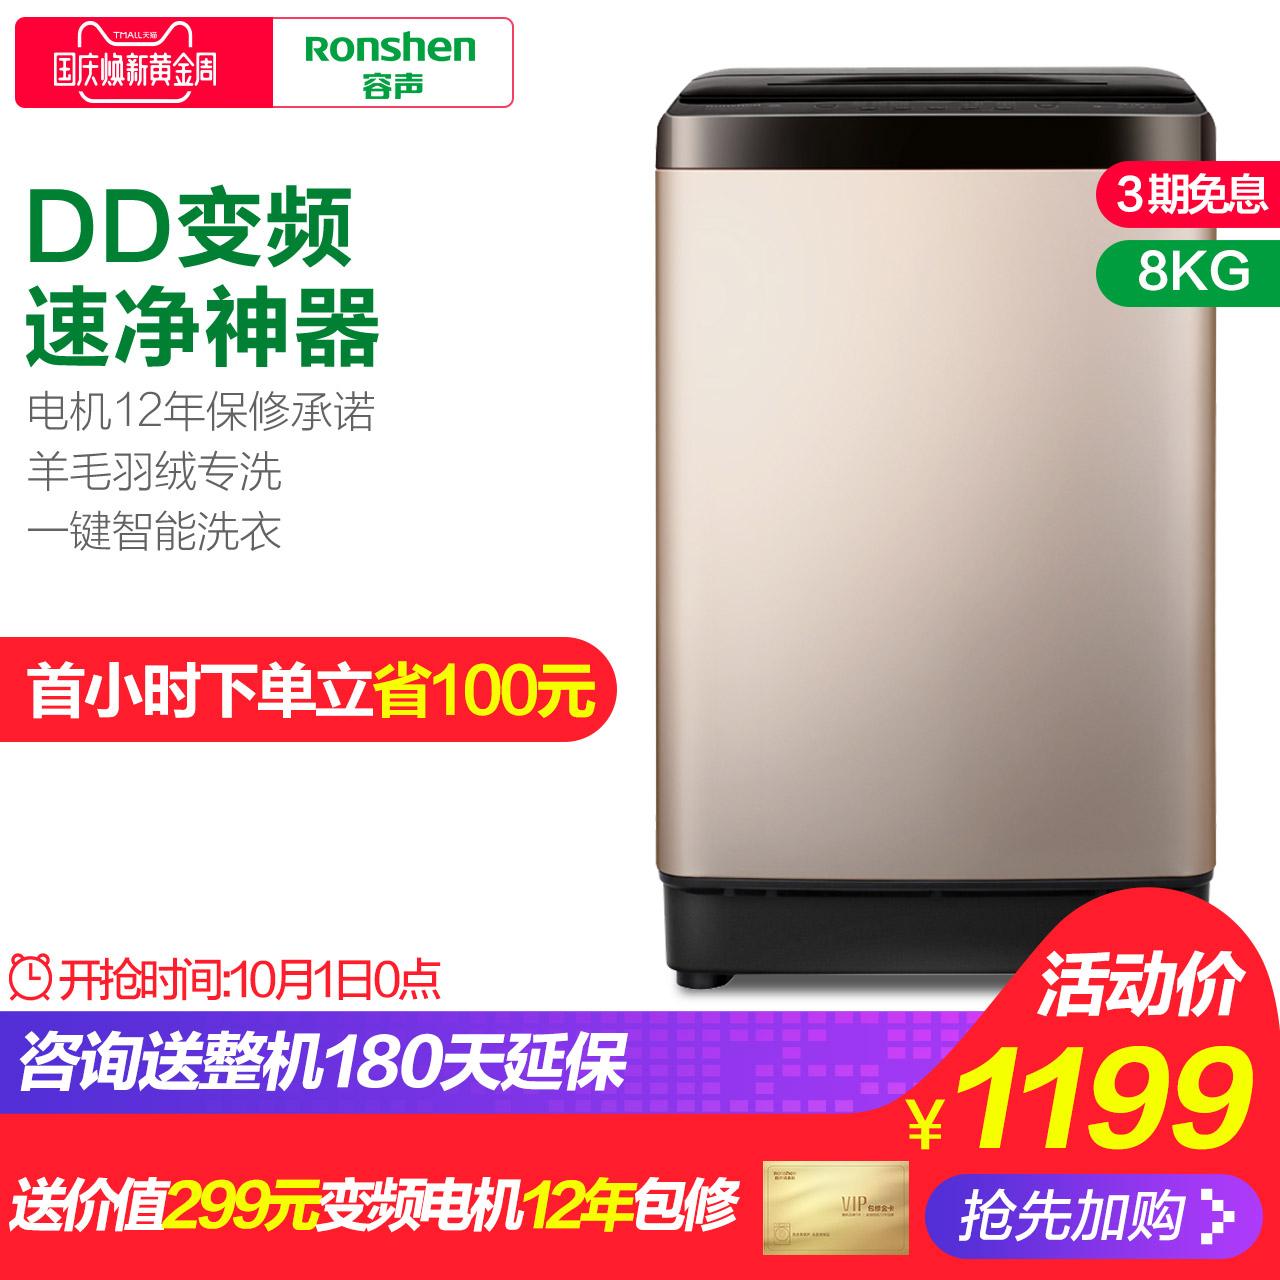 Ronshen-容声RB80D2303BG 8公斤波轮全自动变频洗衣机家用大容量